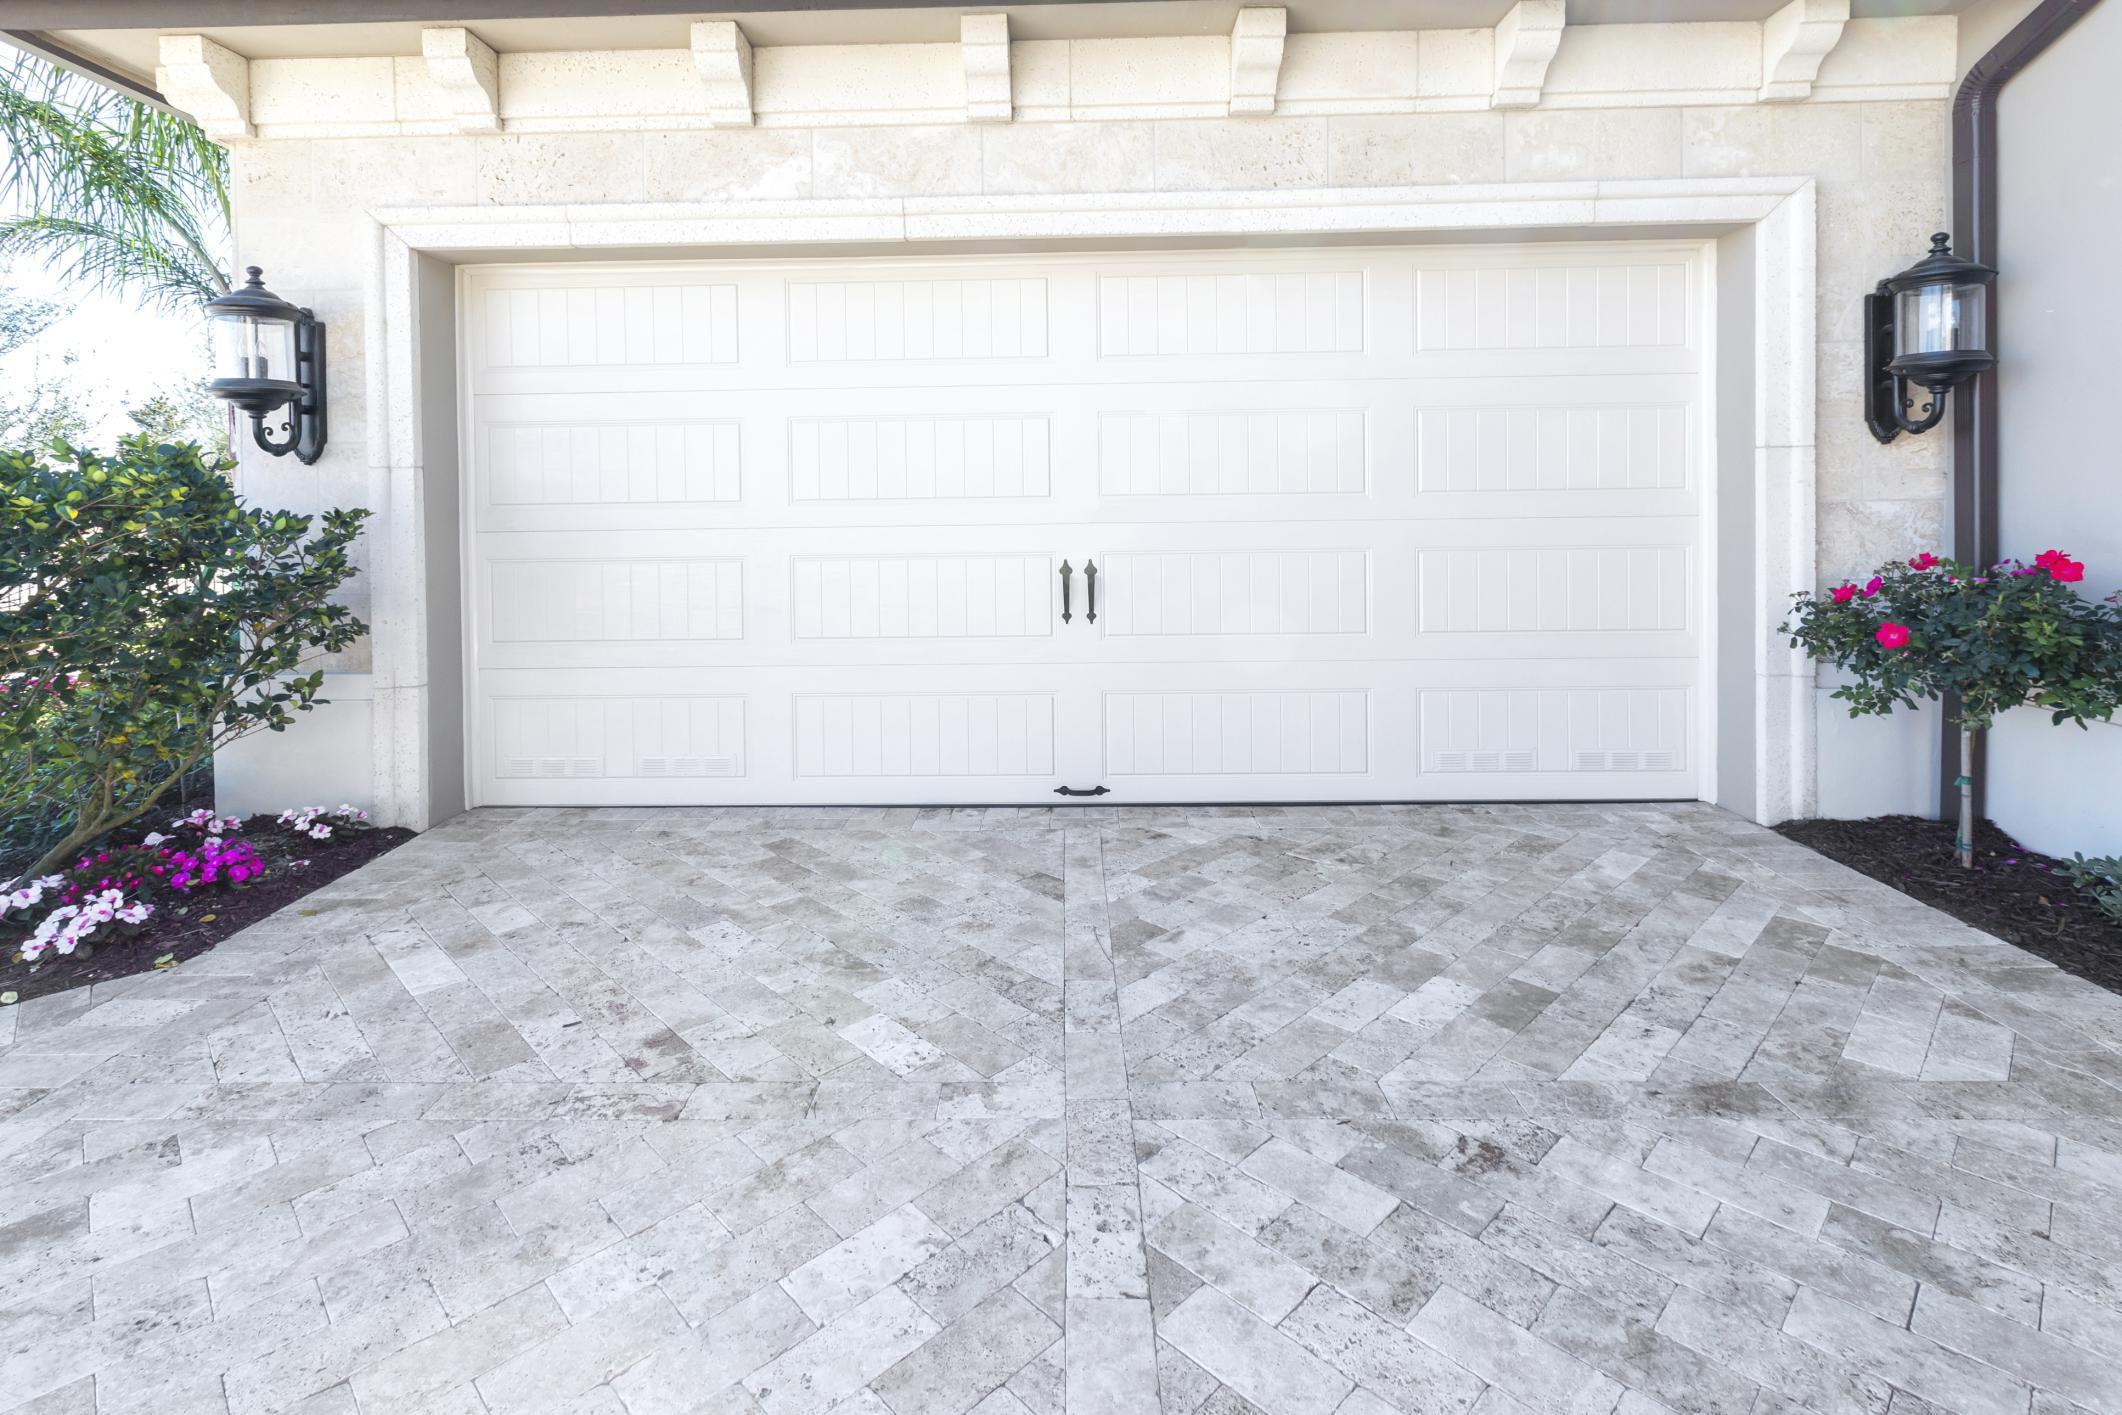 10 Garage Door Safety Tips